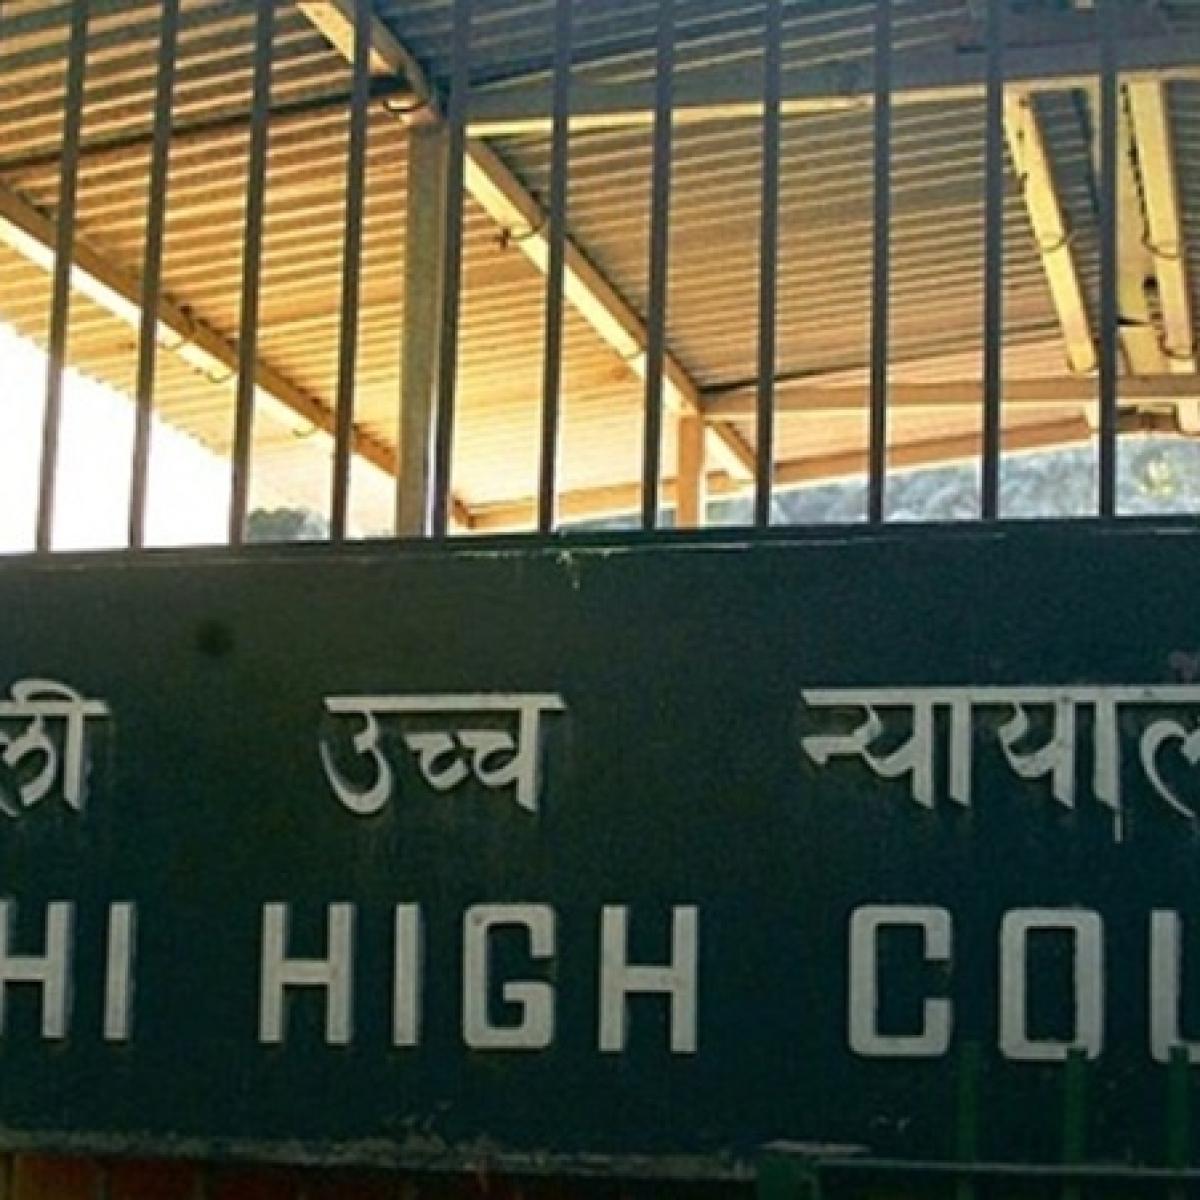 Delhi High Court to hear plea seeking arrest of suspect involved in Northeast Delhi on Feb 26